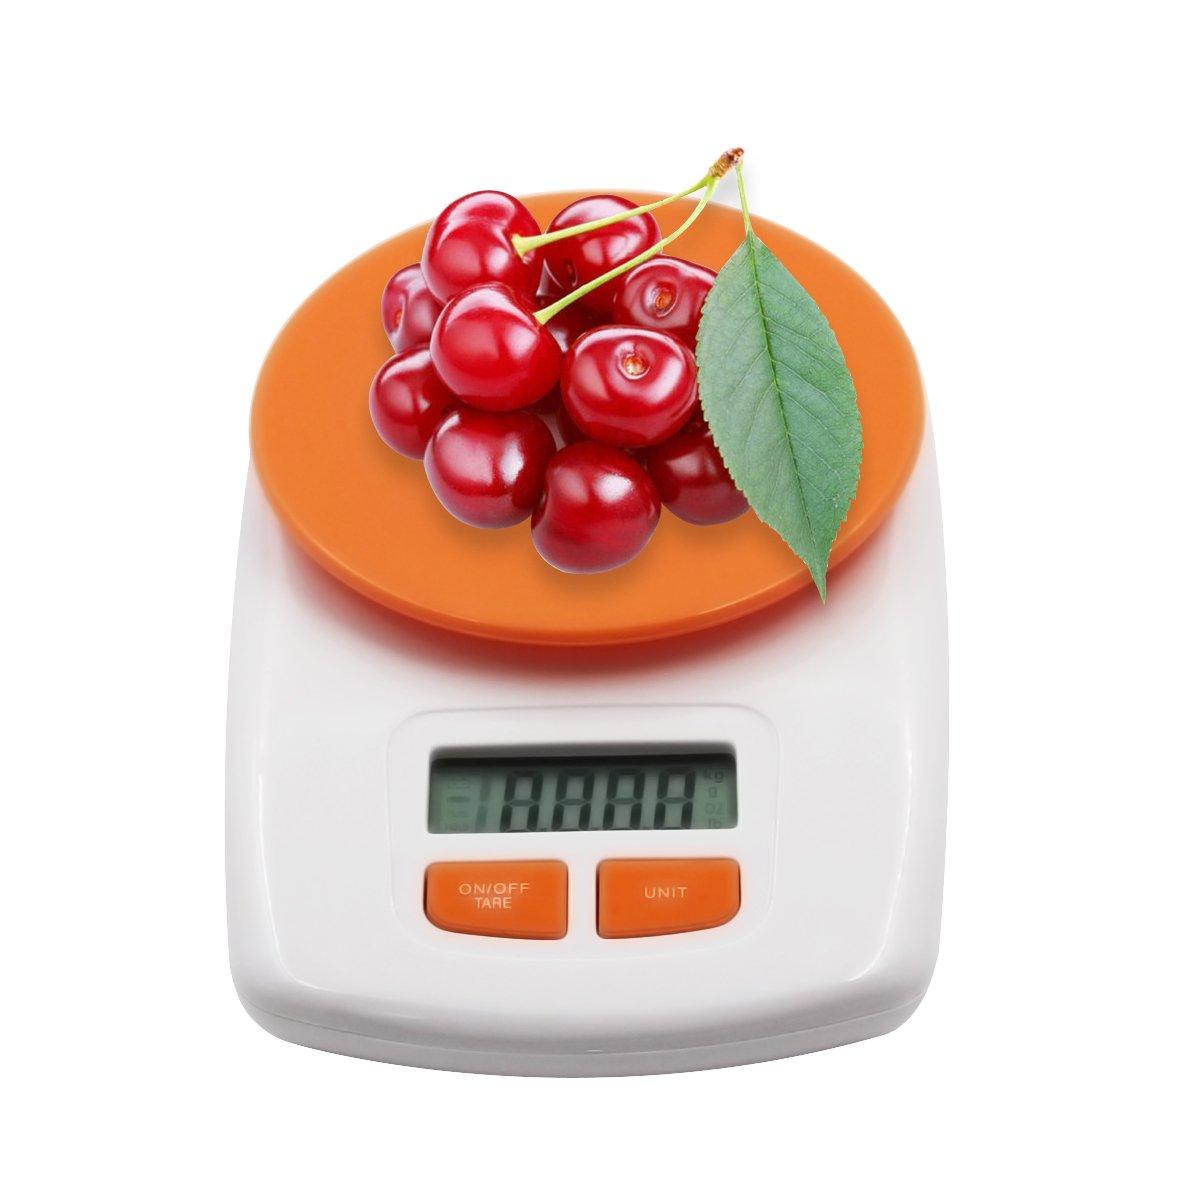 Digital Multifunction Kitchen and Food Scale, Elegant Orange